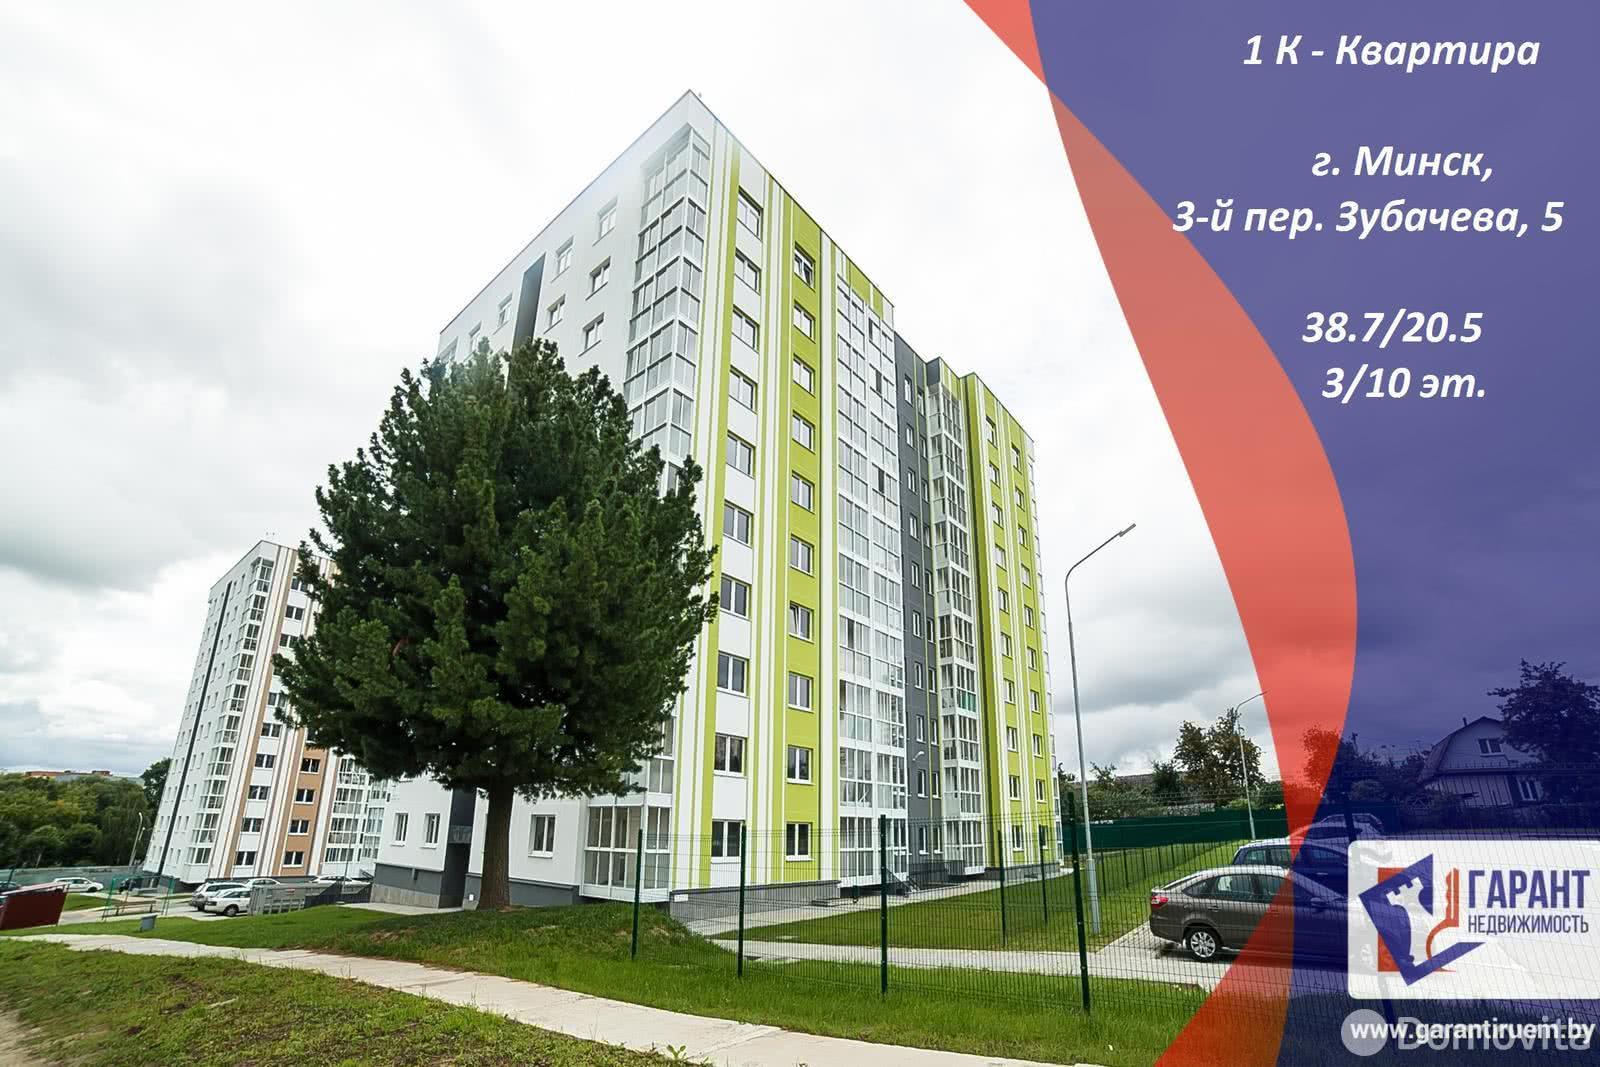 Купить 1-комнатную квартиру в Минске, пер. Зубачева 3-й, д. 5 - фото 1